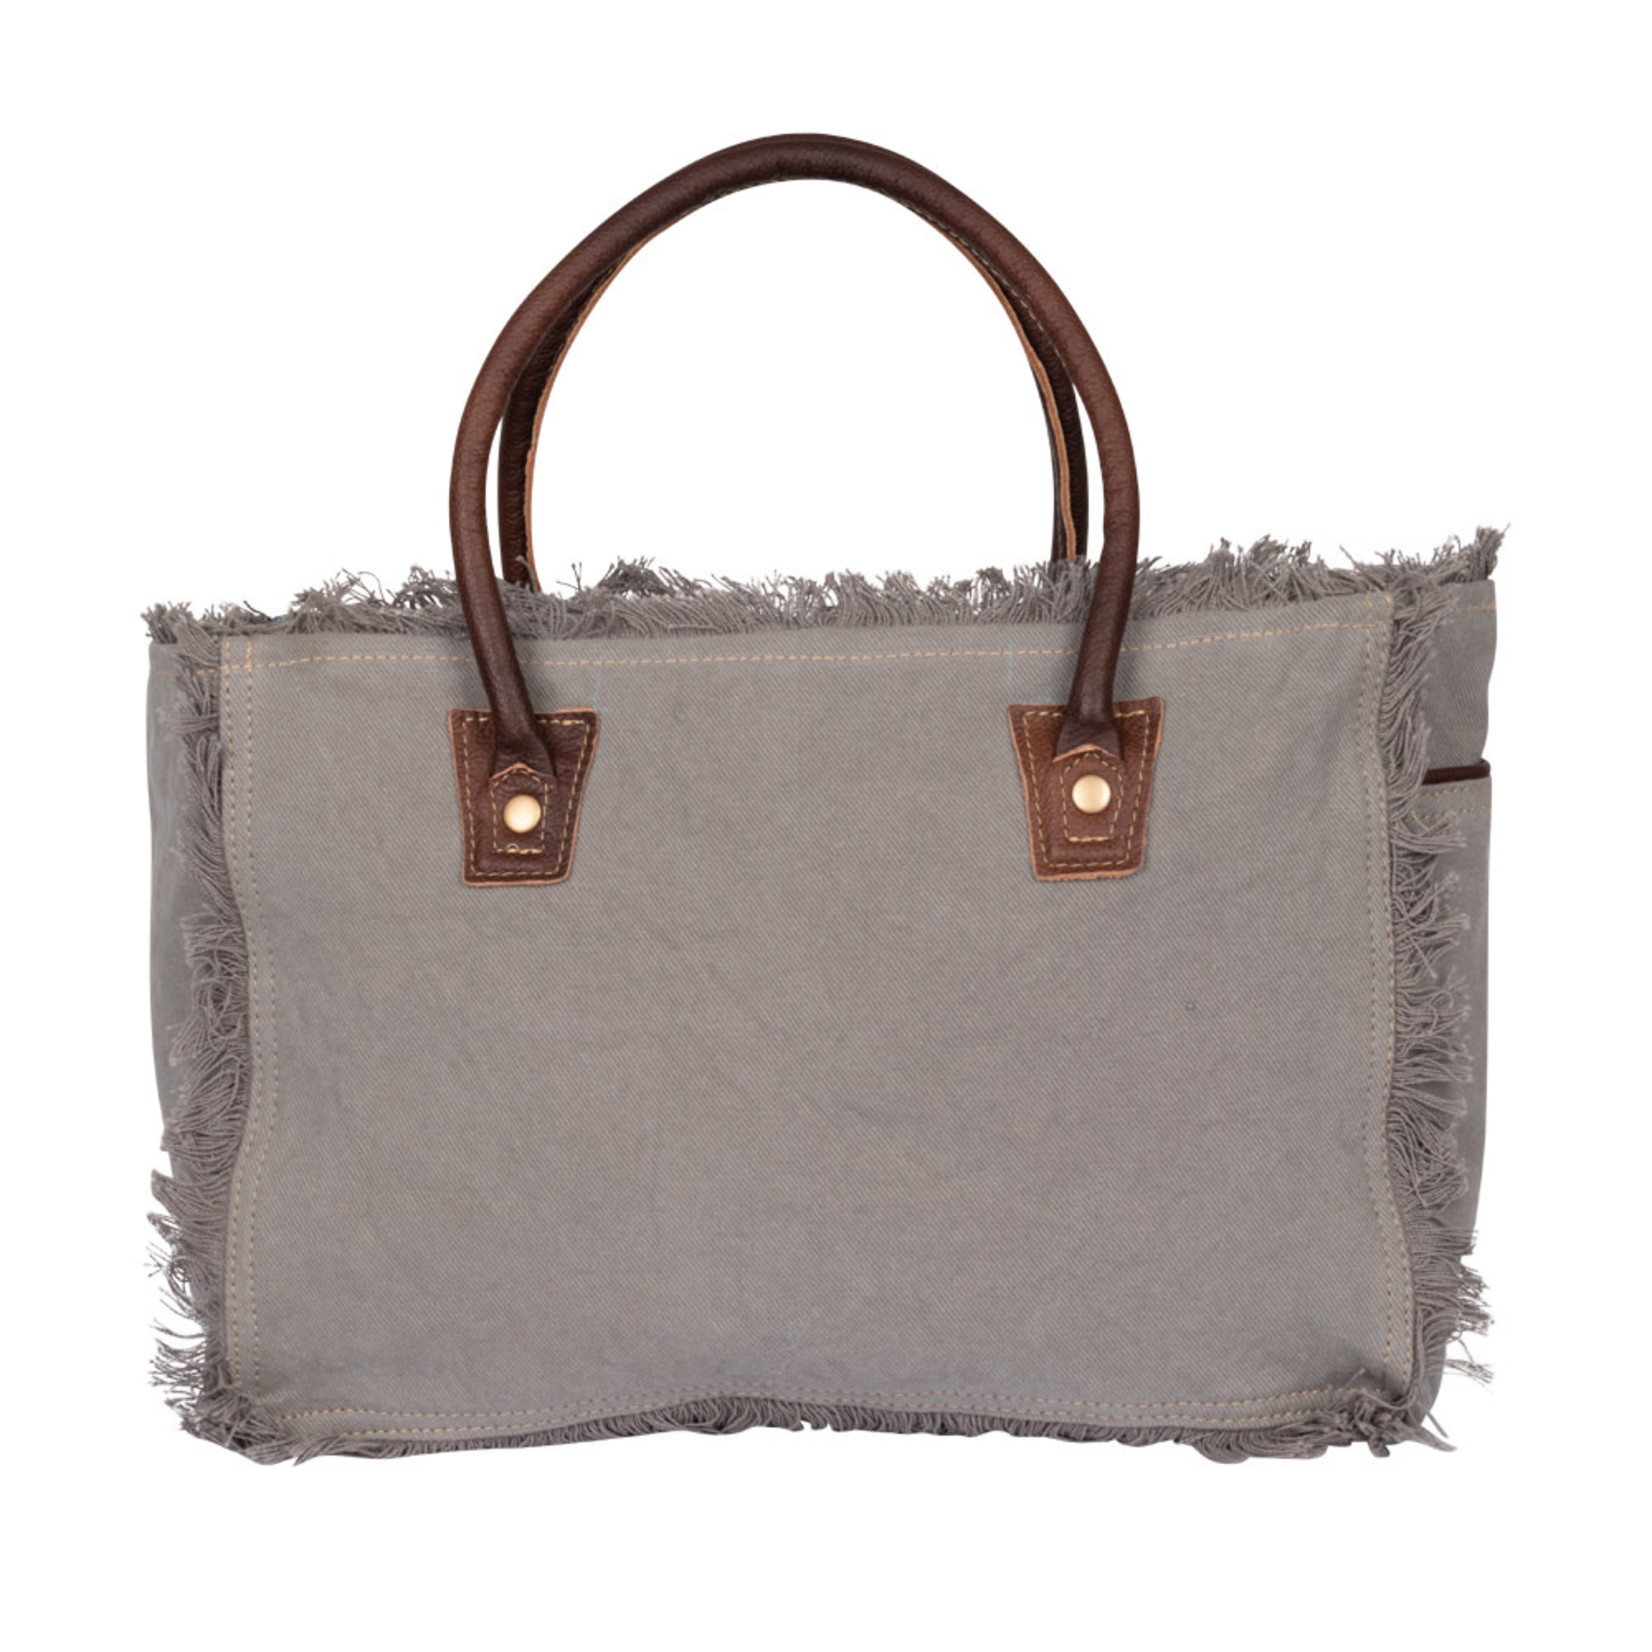 Myra Bags S-2130 Mystique Marvel Bag